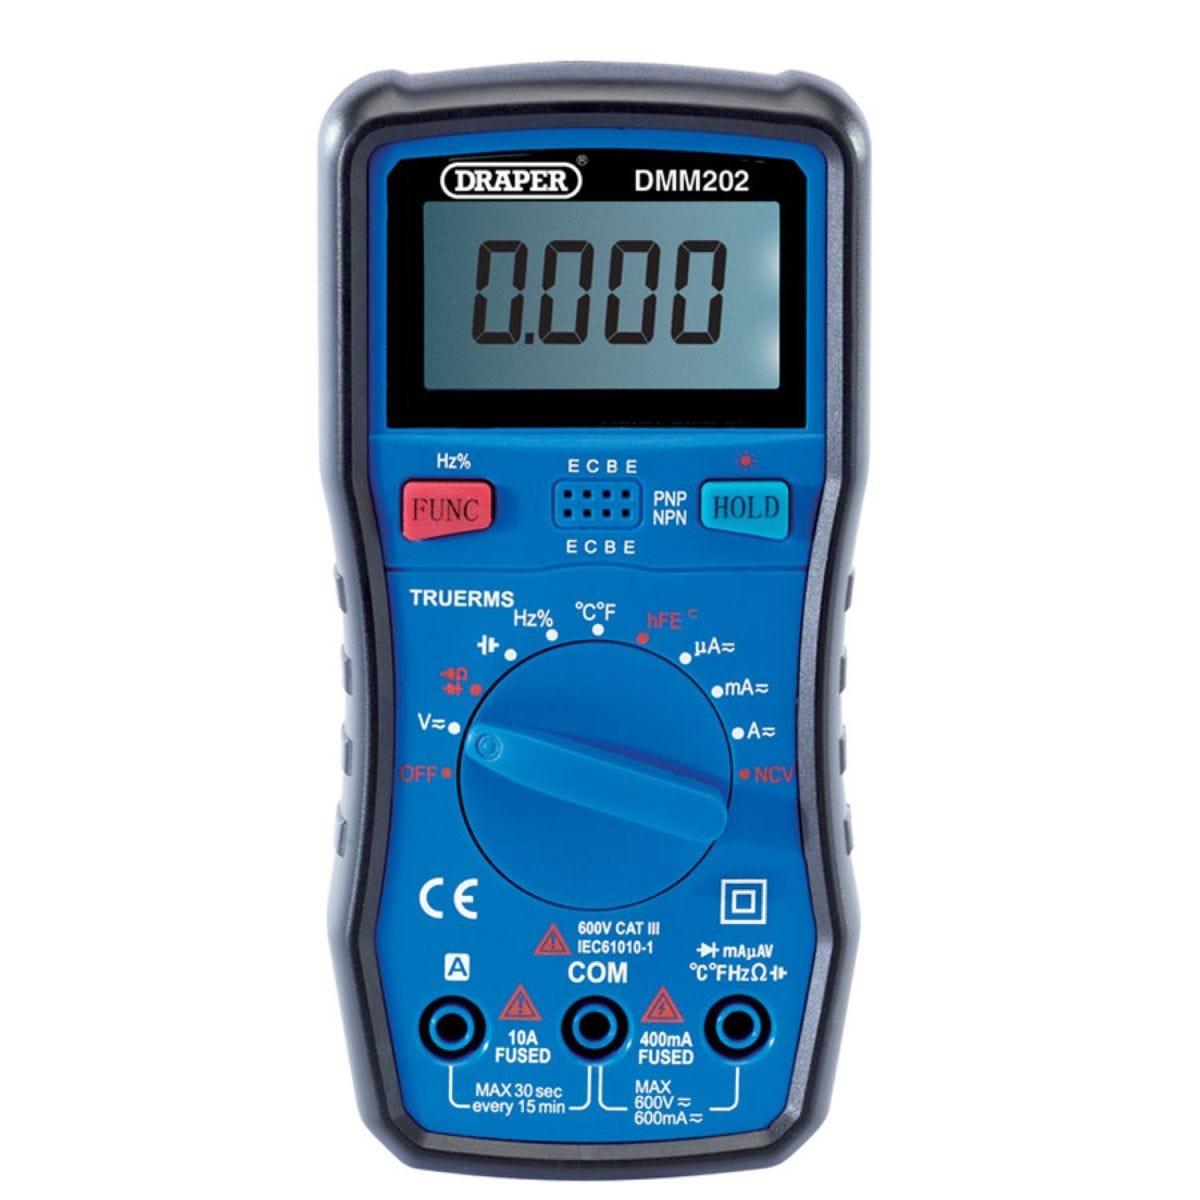 Draper DMM202 Auto Ranging Digital Multimeter